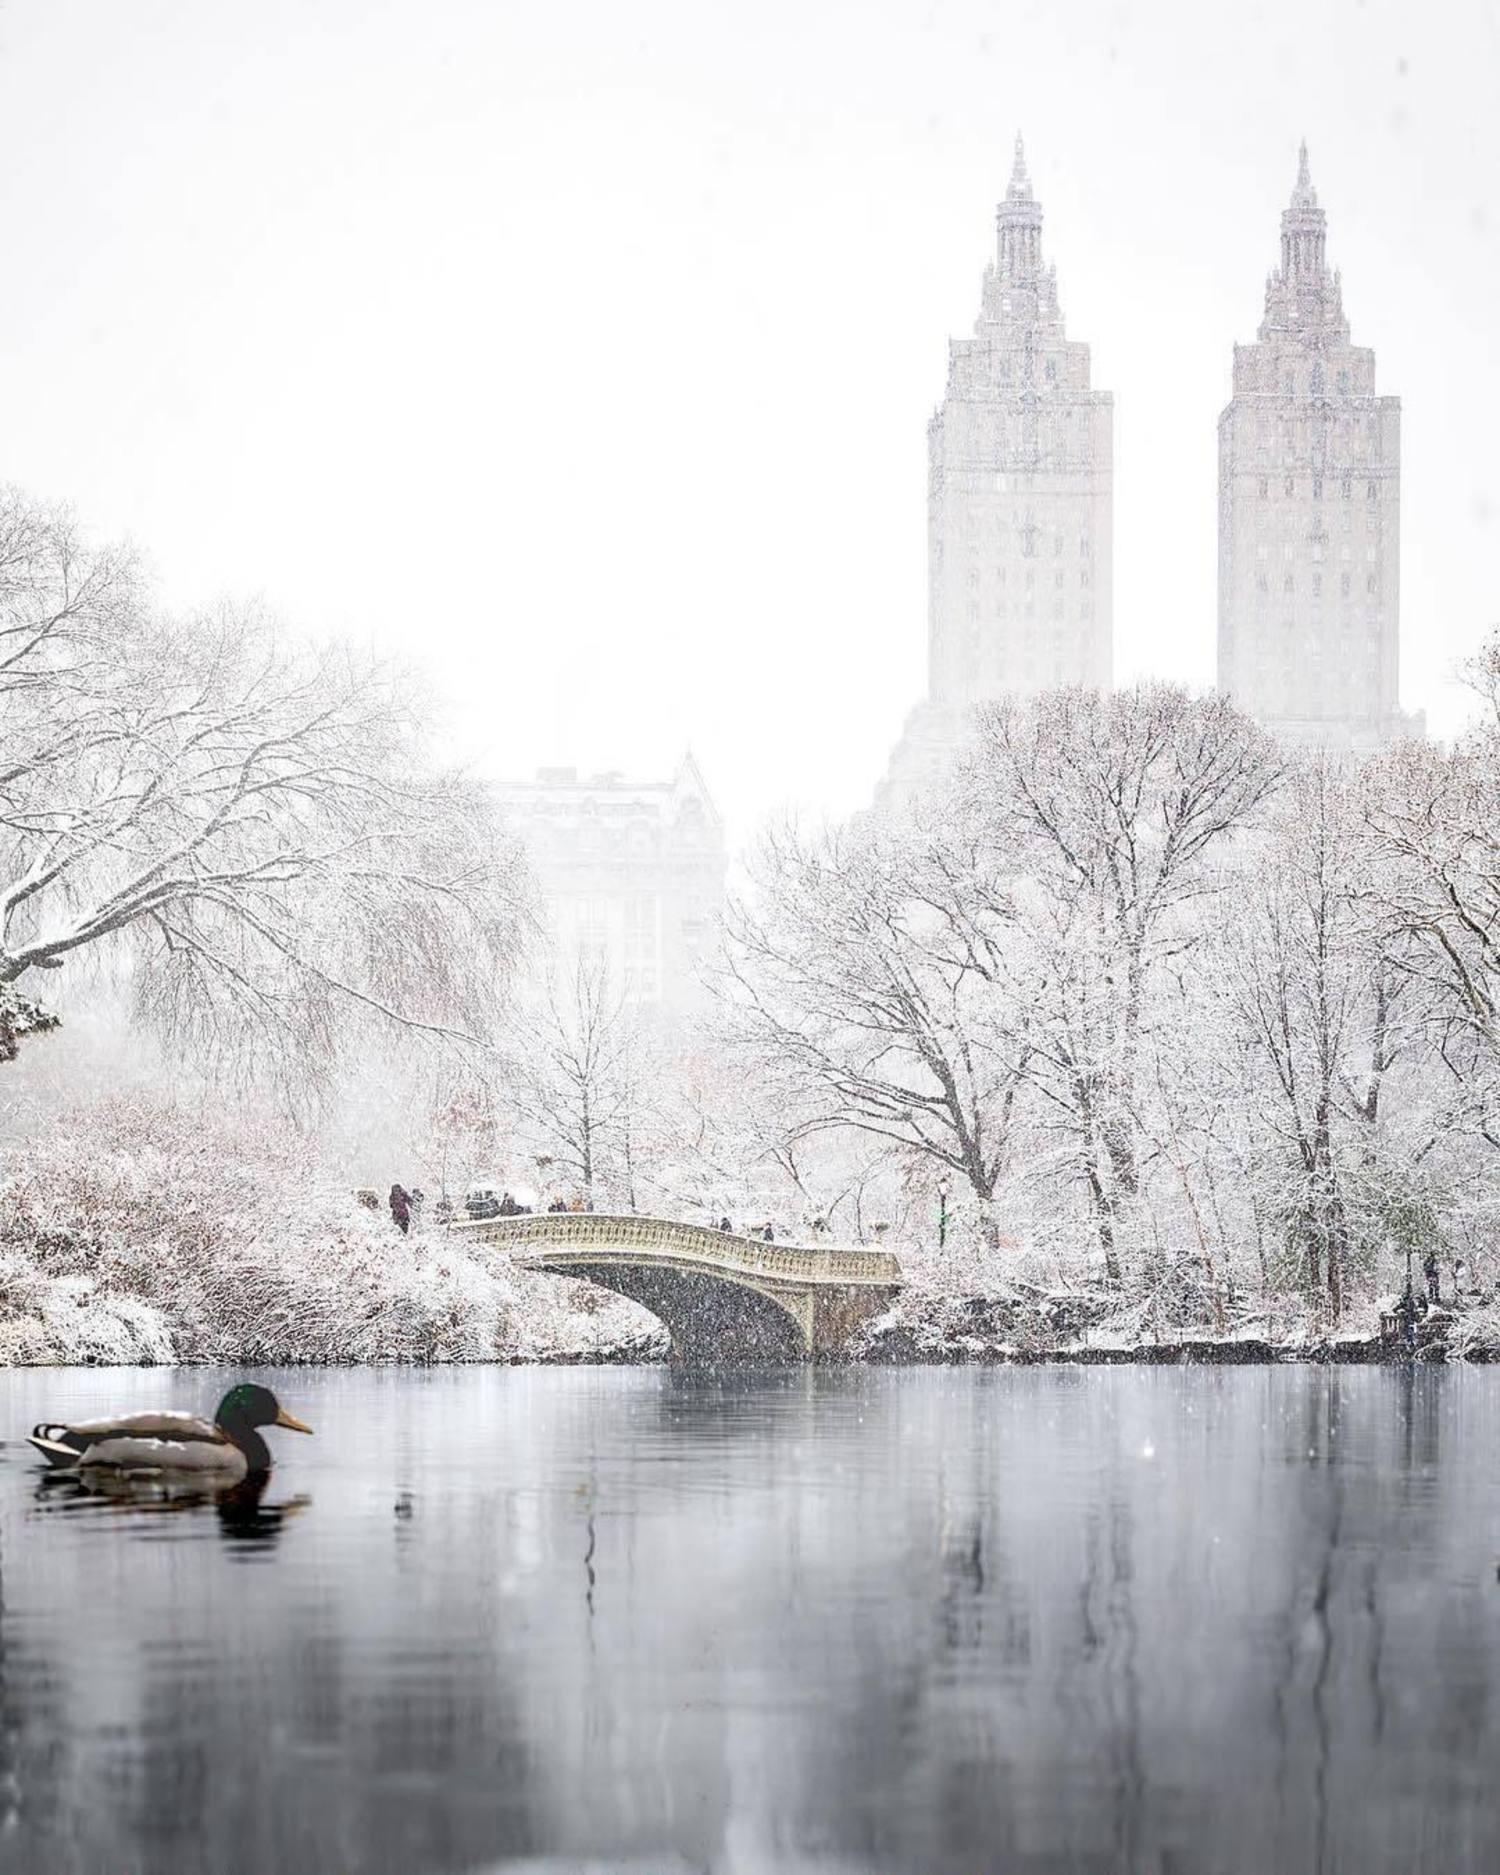 The Lake, Central Park, Manhattan. Photo via @beholdingeye #viewingnyc #nyc #newyork #newyorkcity #centralpark